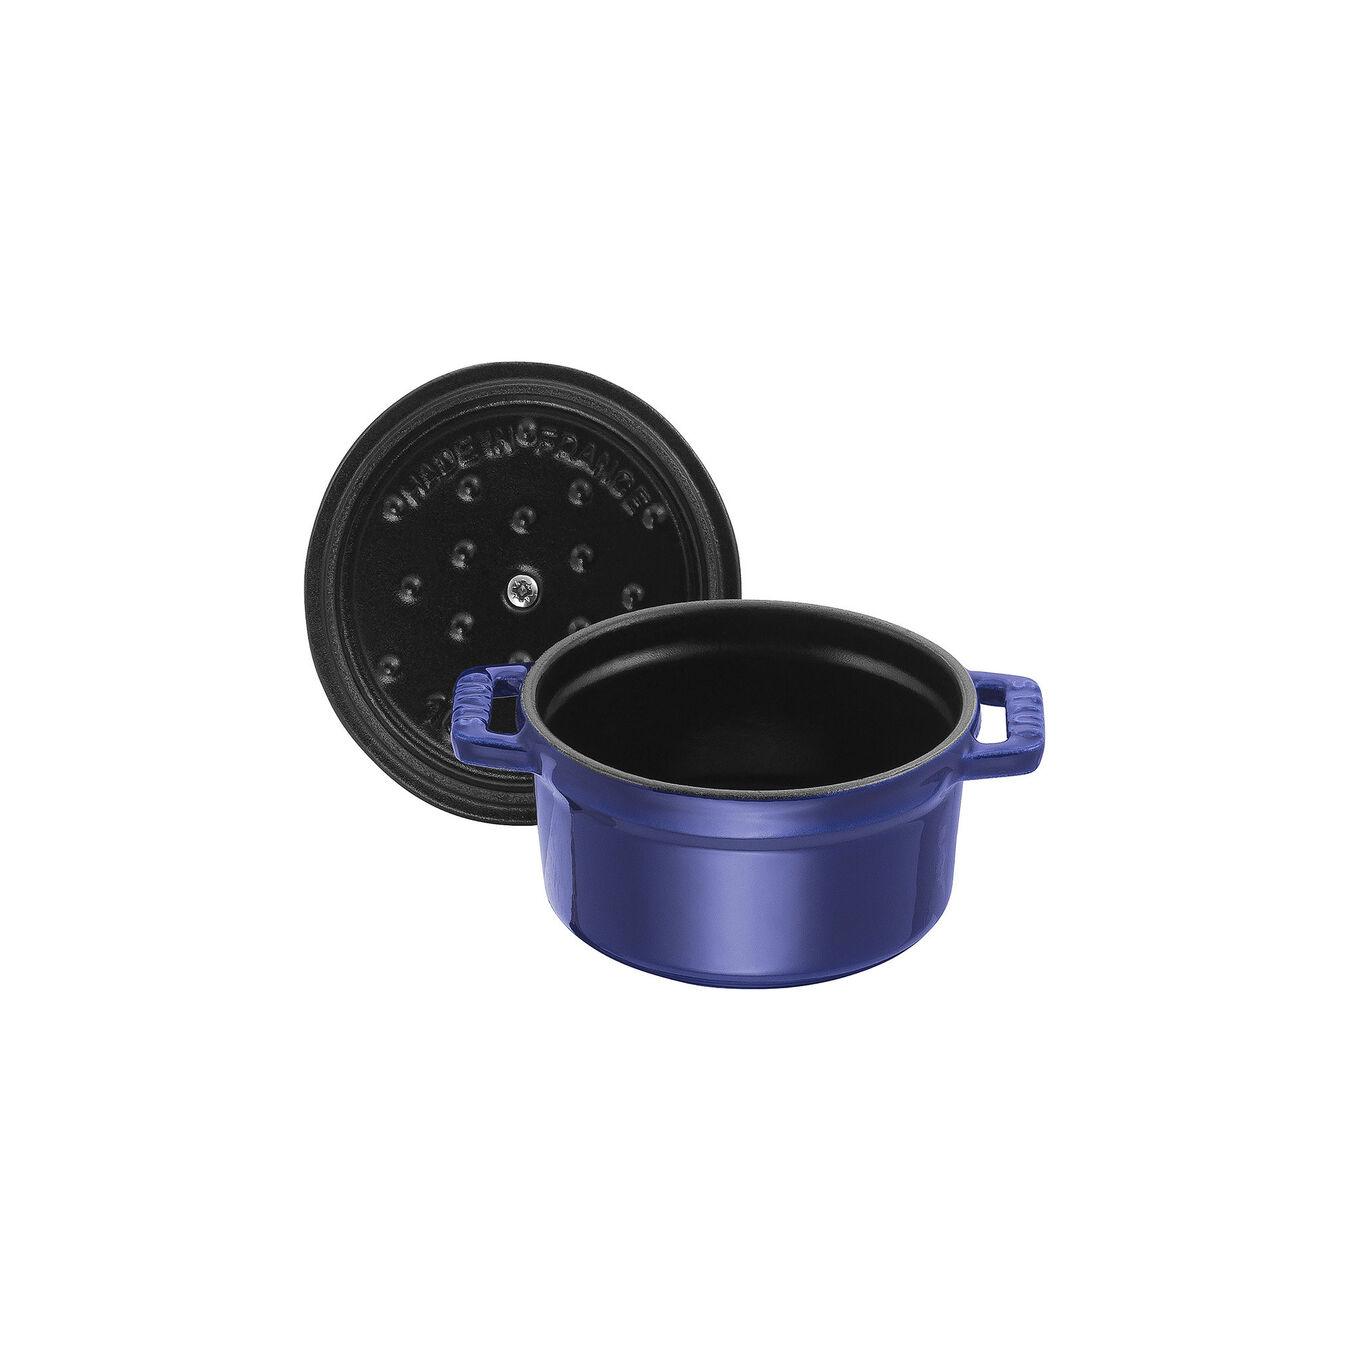 0.275 qt, Mini Cocotte, dark blue,,large 4